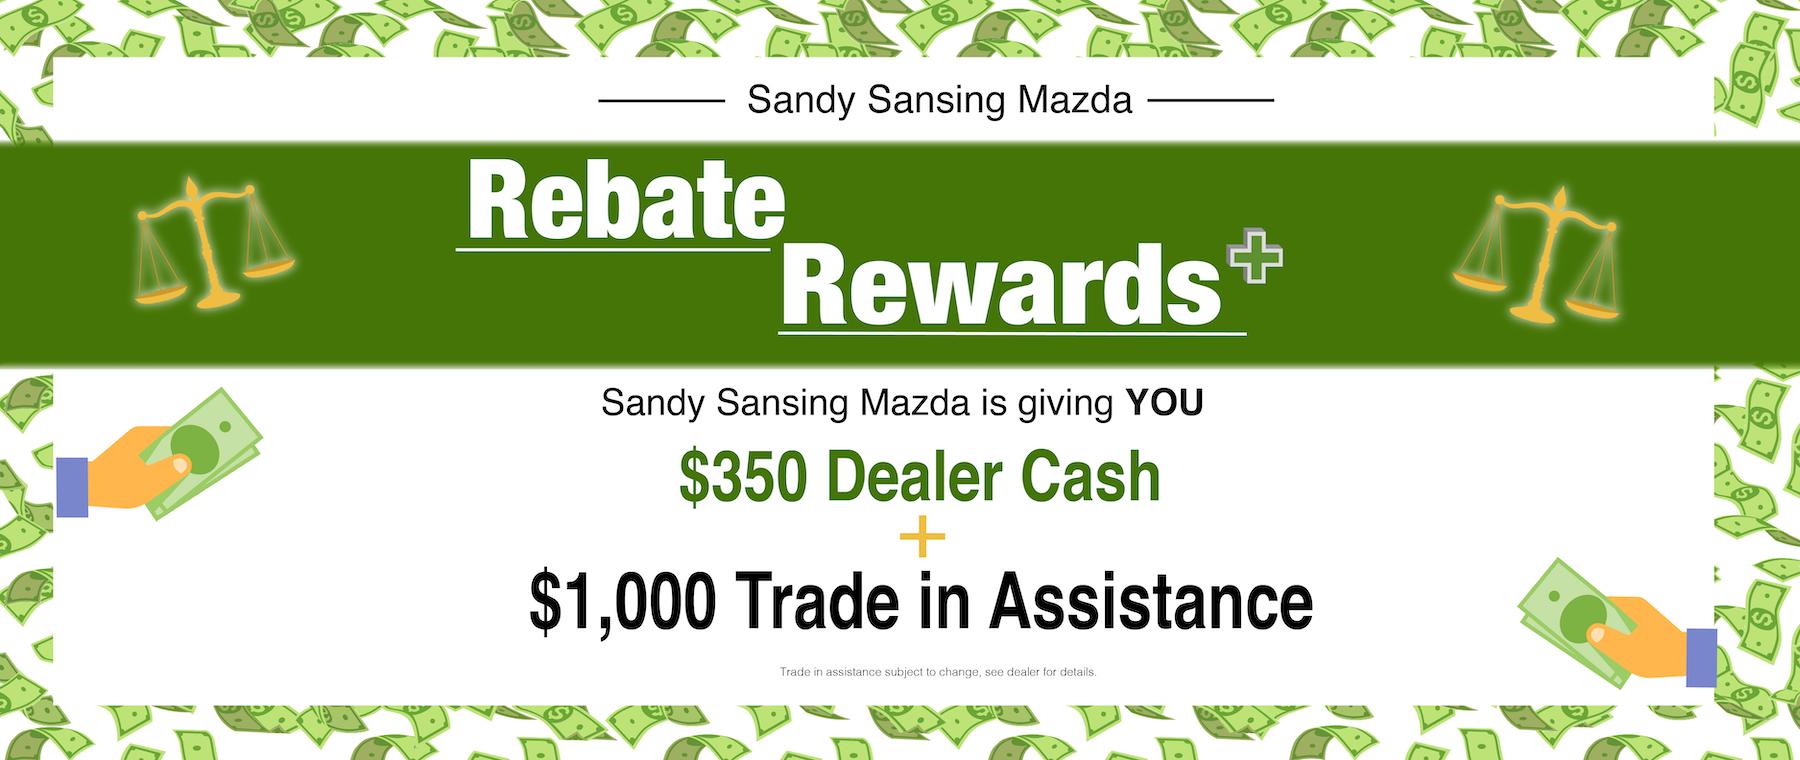 Rebate rewards plus 1_Website-Carousel-Graphic-v3_1